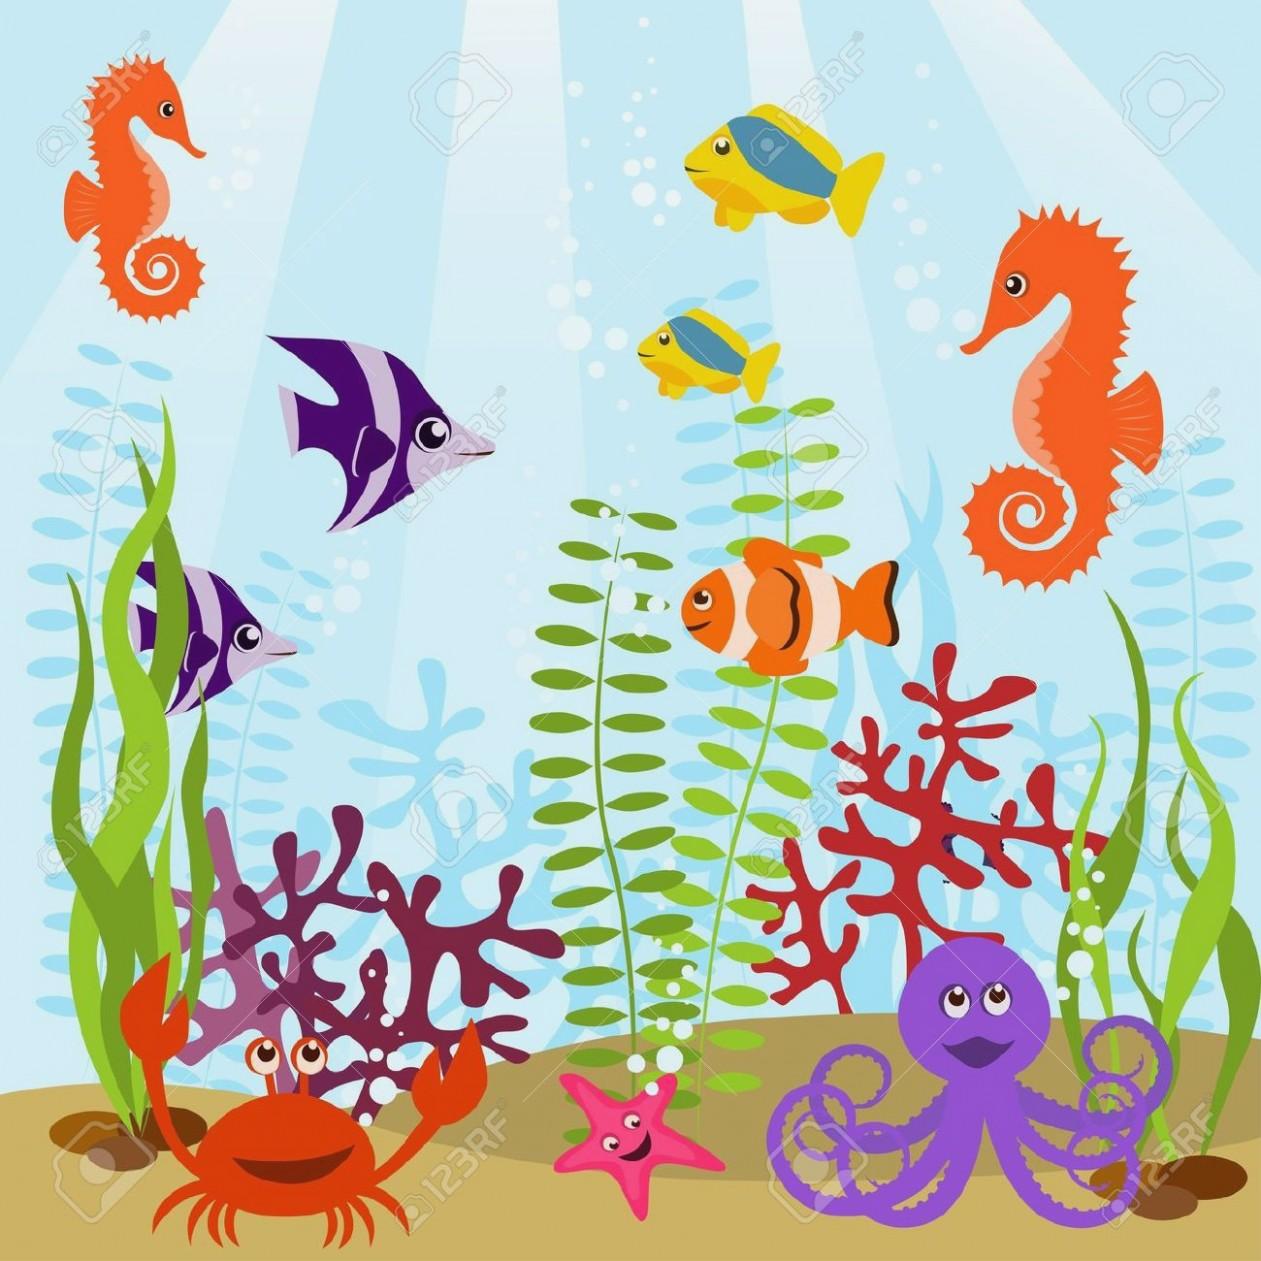 How to get people. Aquarium clipart animated